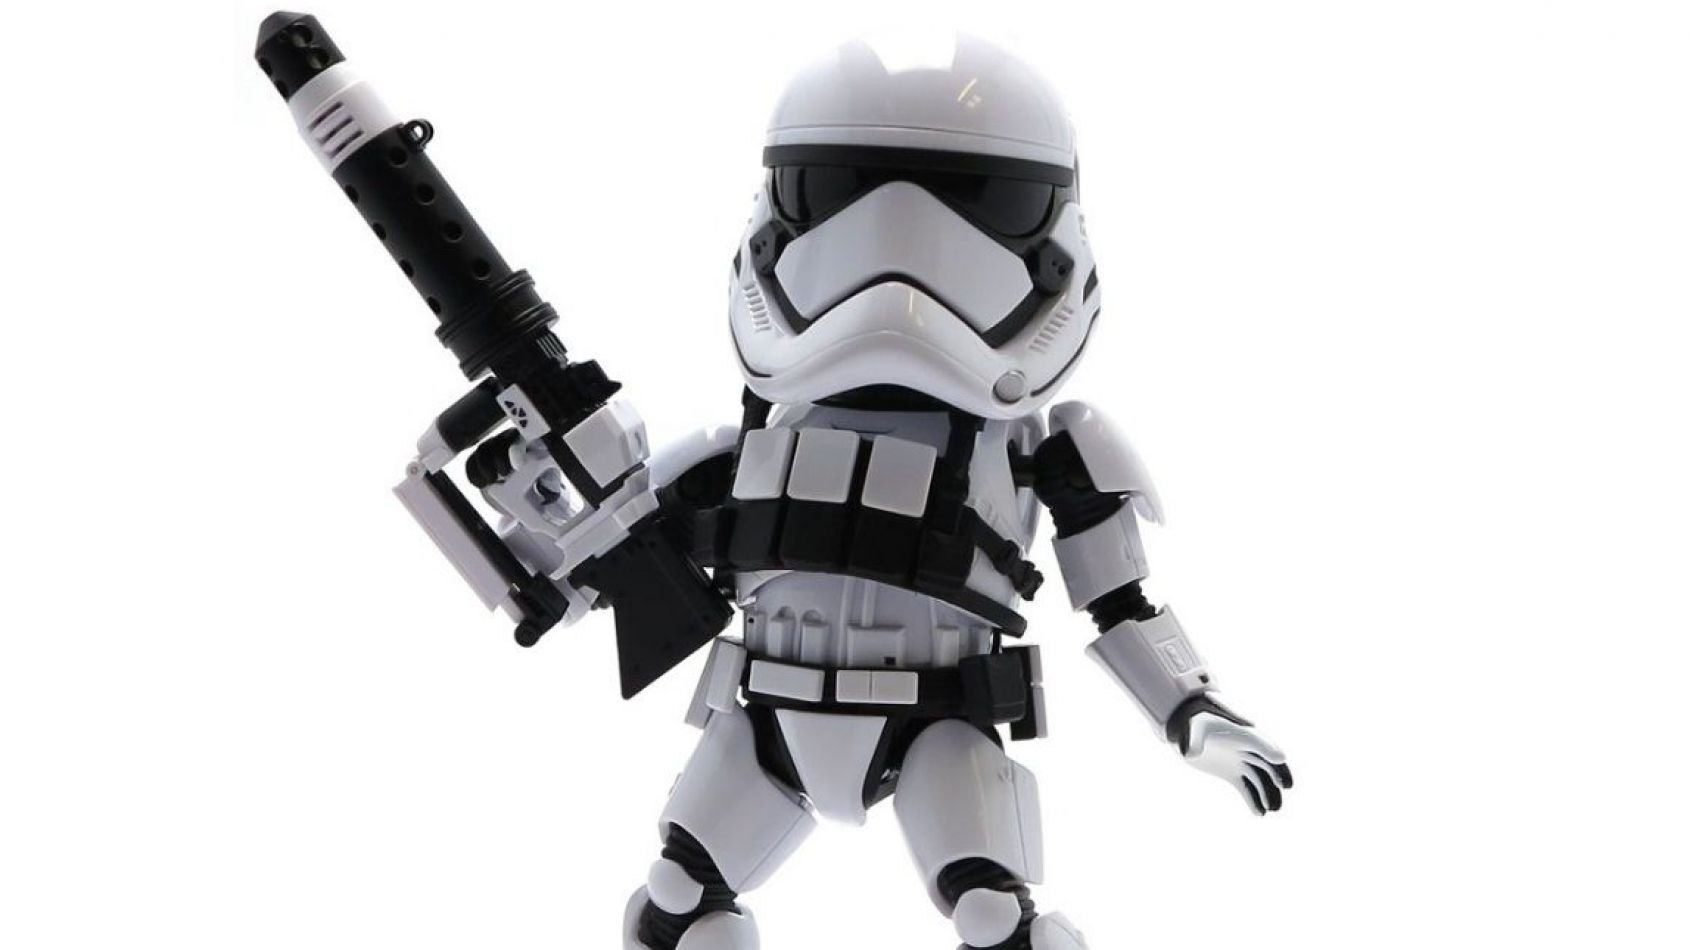 Les figurines Star Wars Egg Attack débarquent chez Artoyz